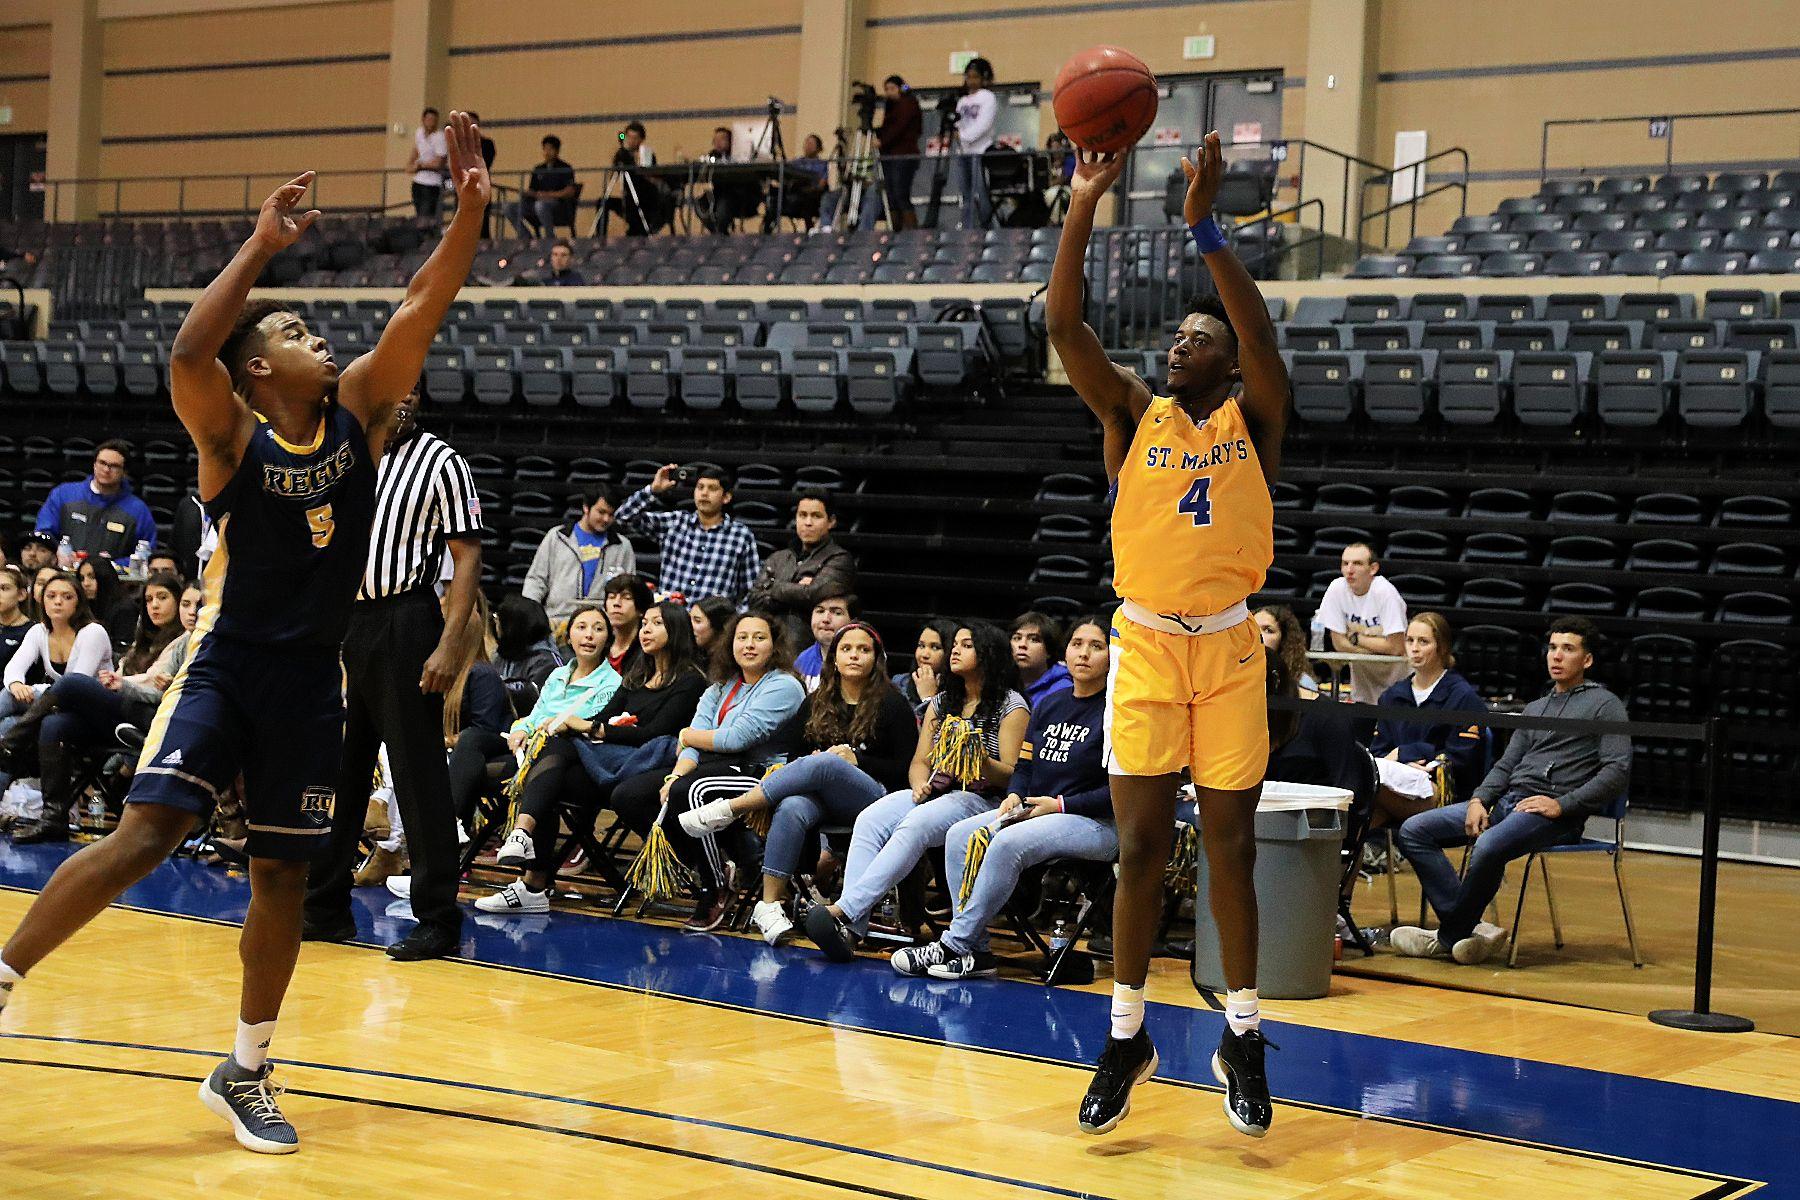 Stmu Men S Basketball Sweeps Courtyard Marriott Classic Mens Basketball Basketball Basketball Teams